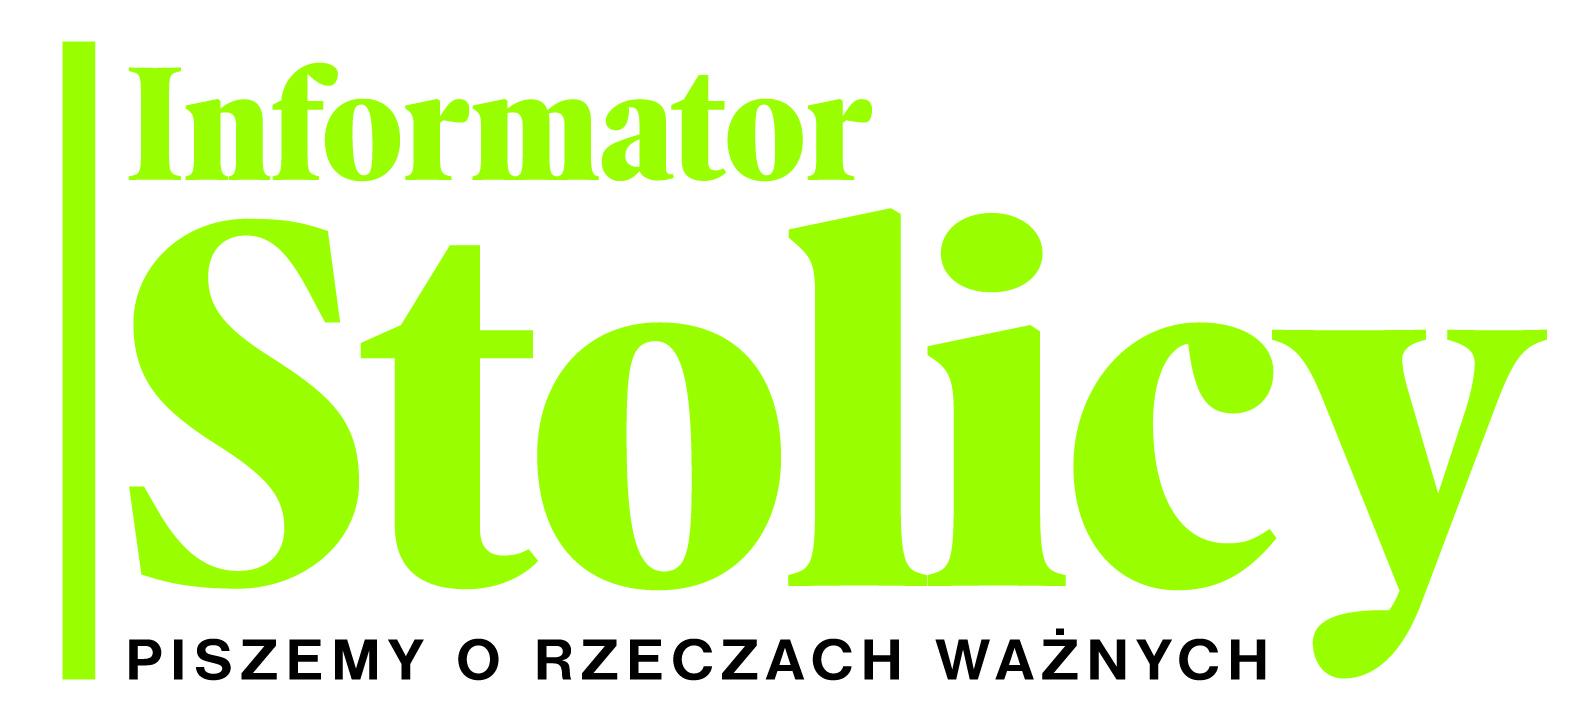 informator-stolicy